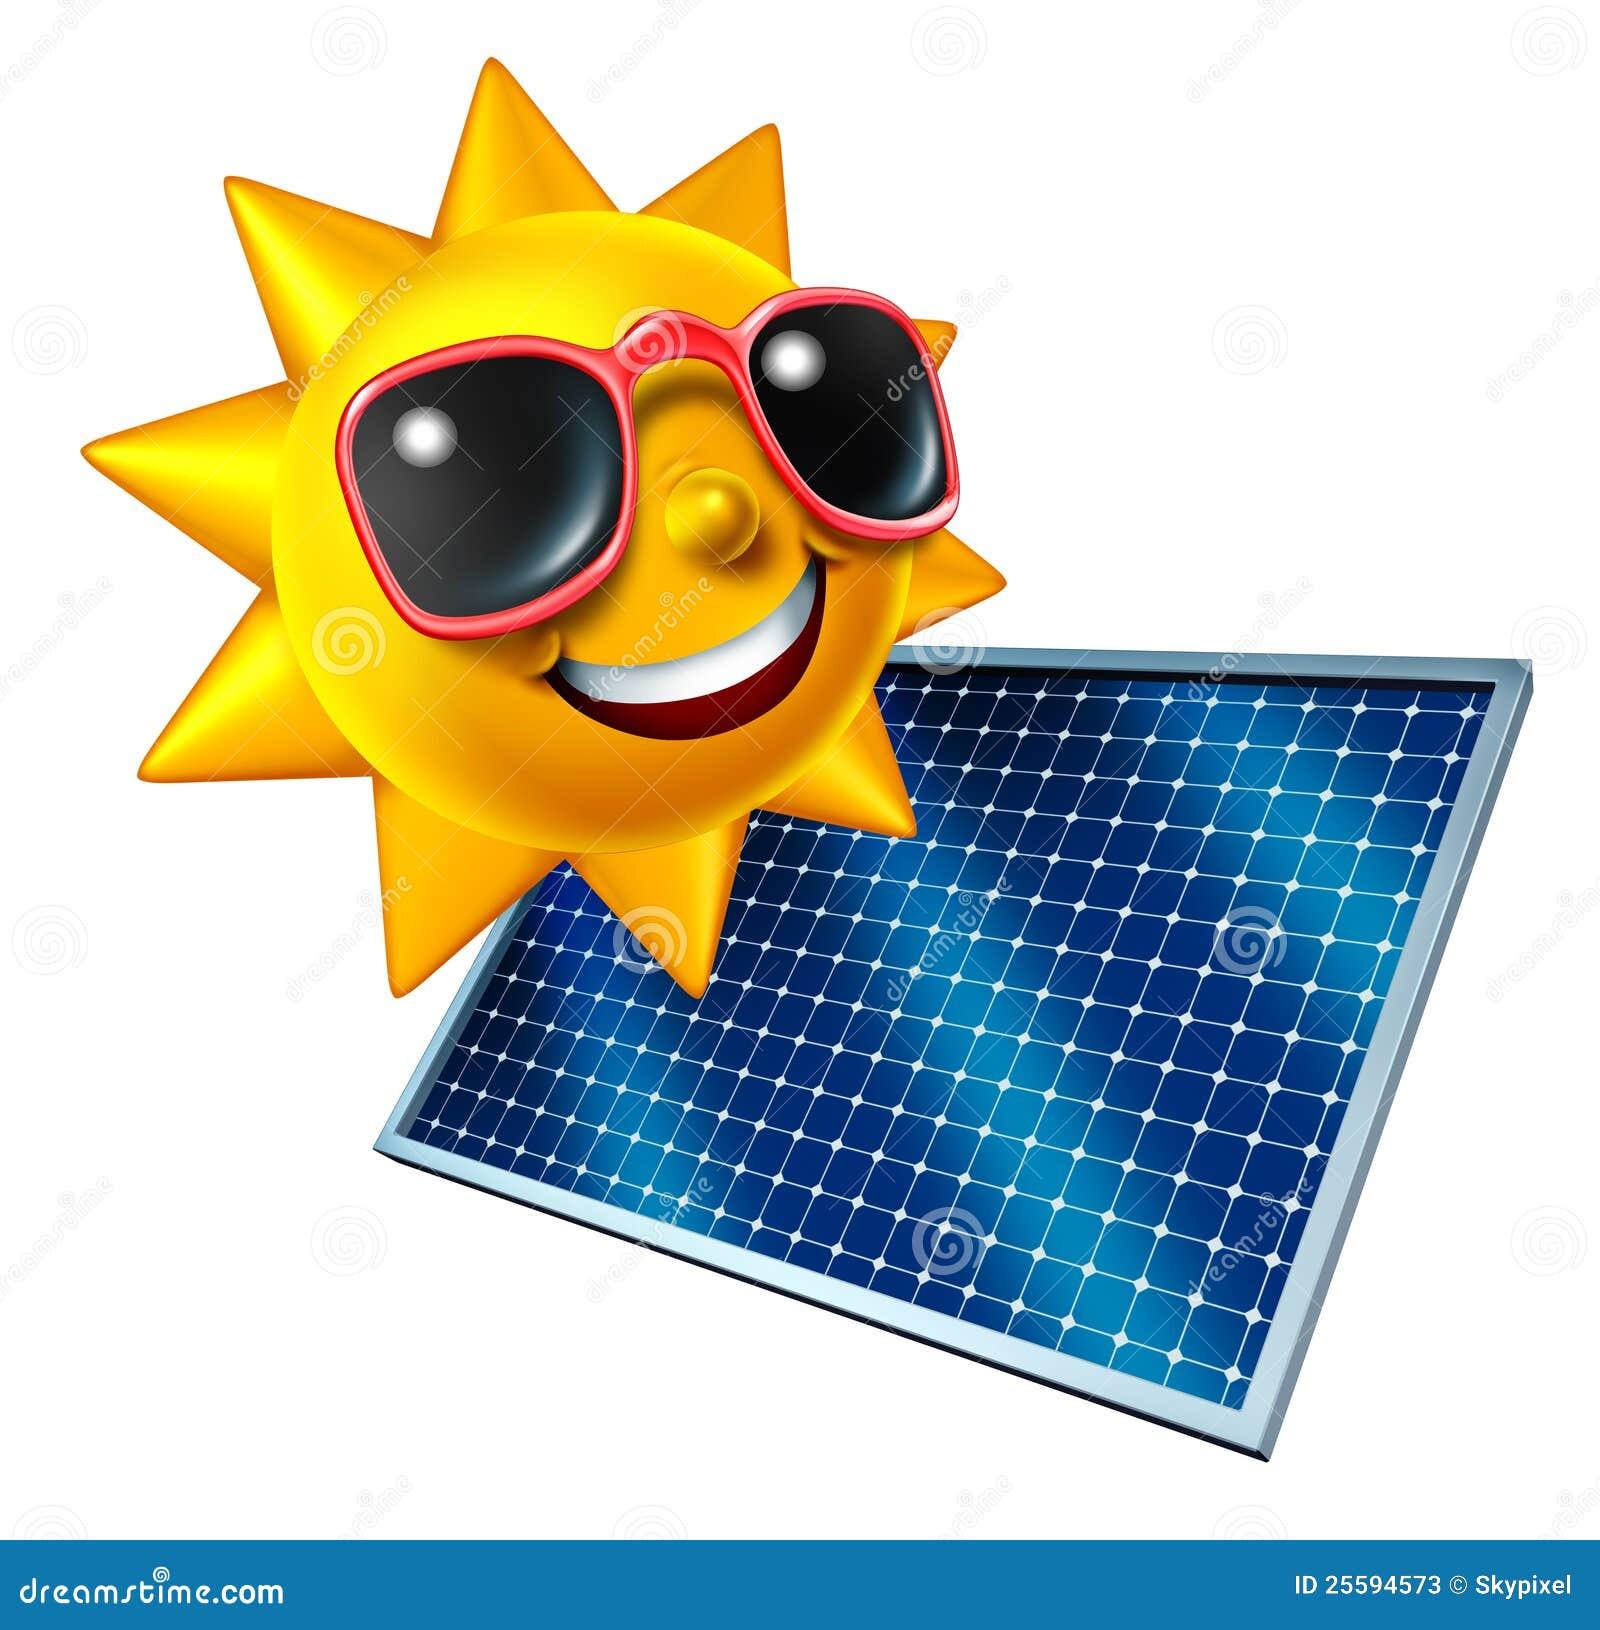 clip art solar power - photo #23